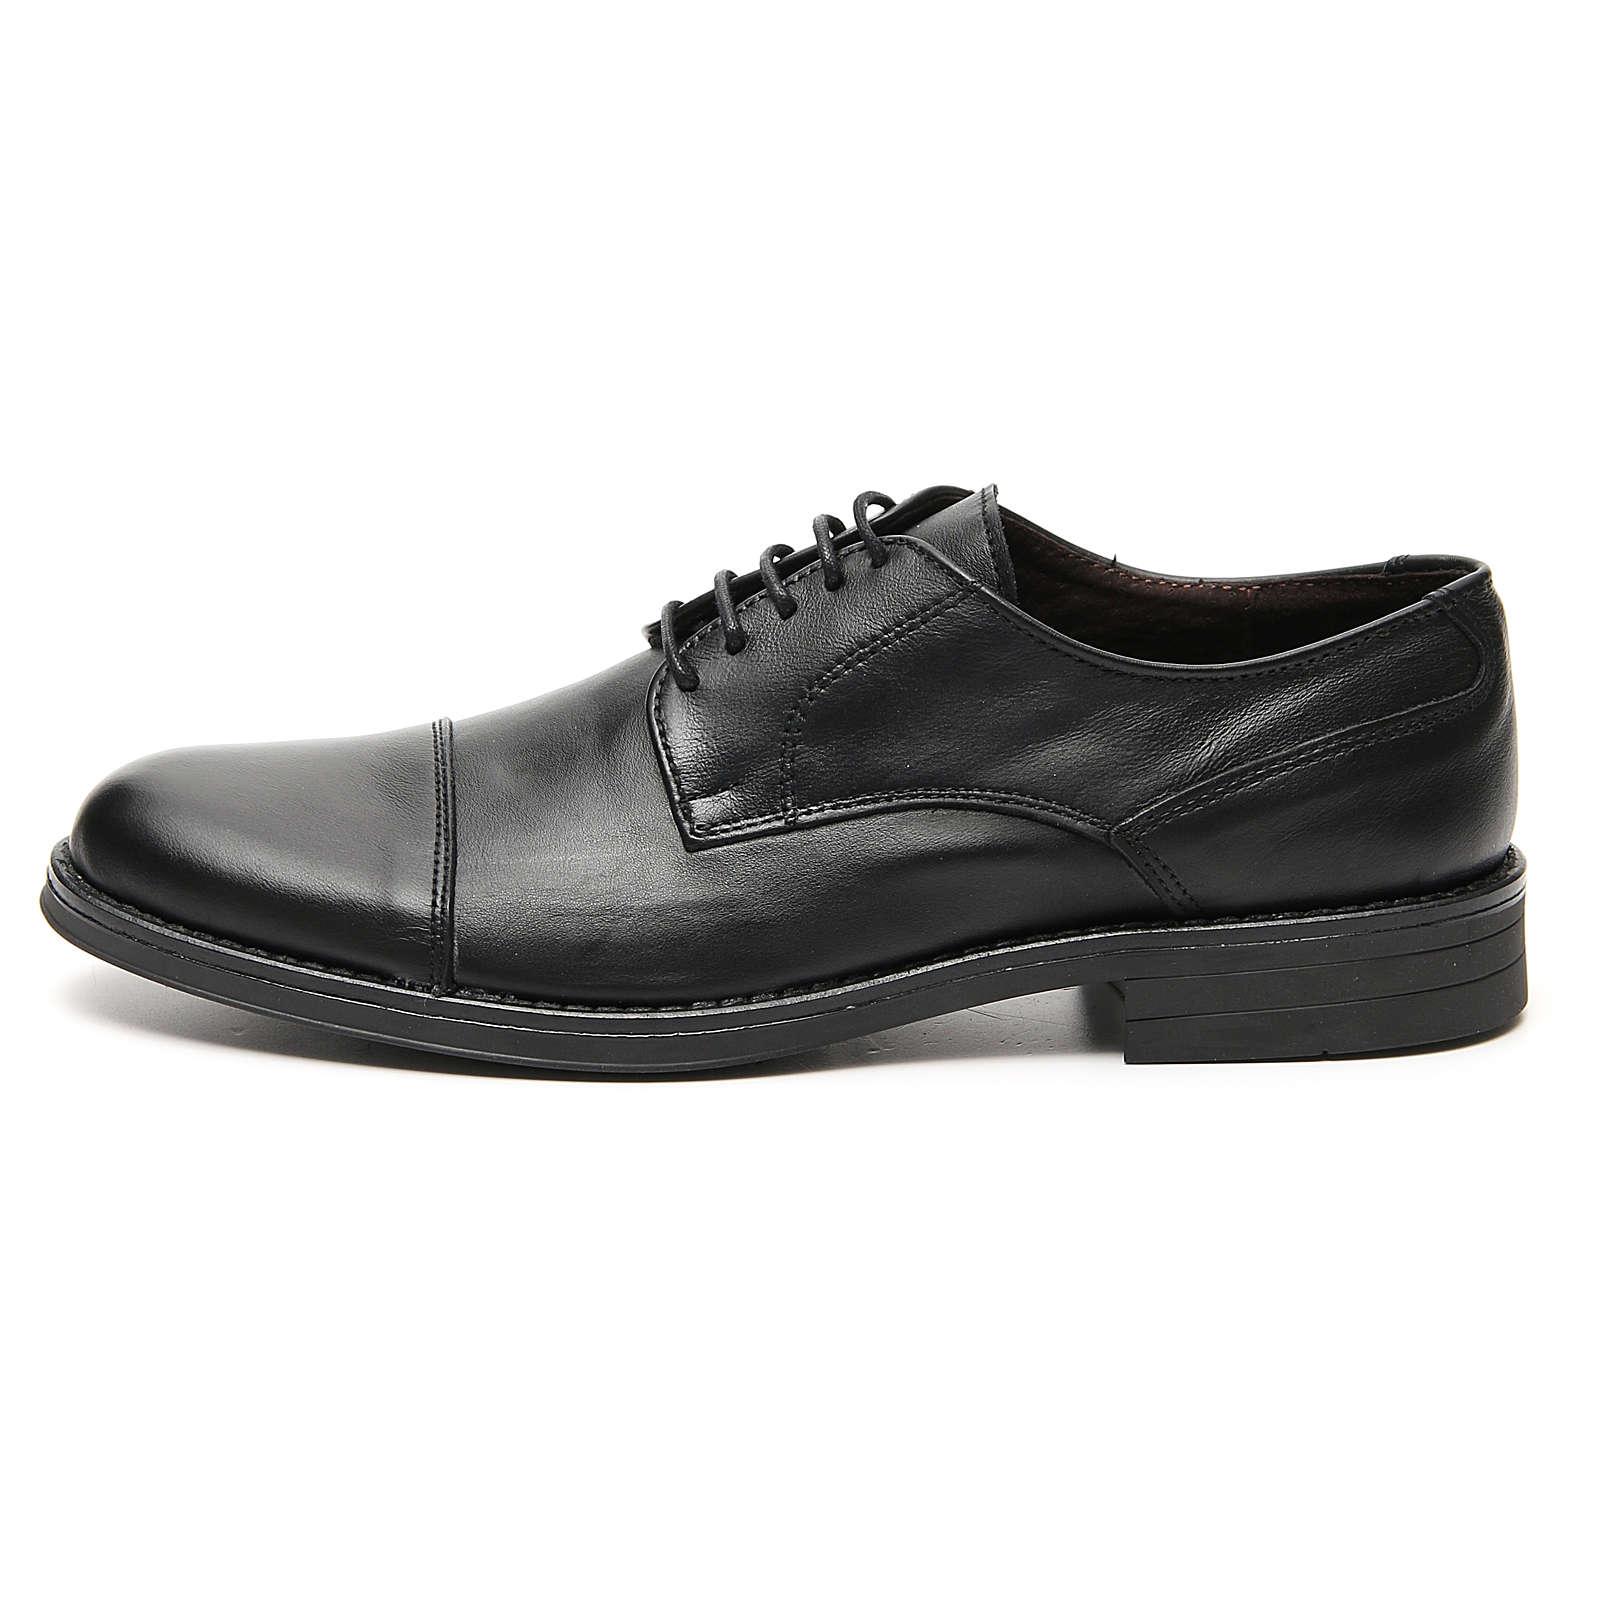 Zapatos verdadero cuero negro opaco con punta cortada 4